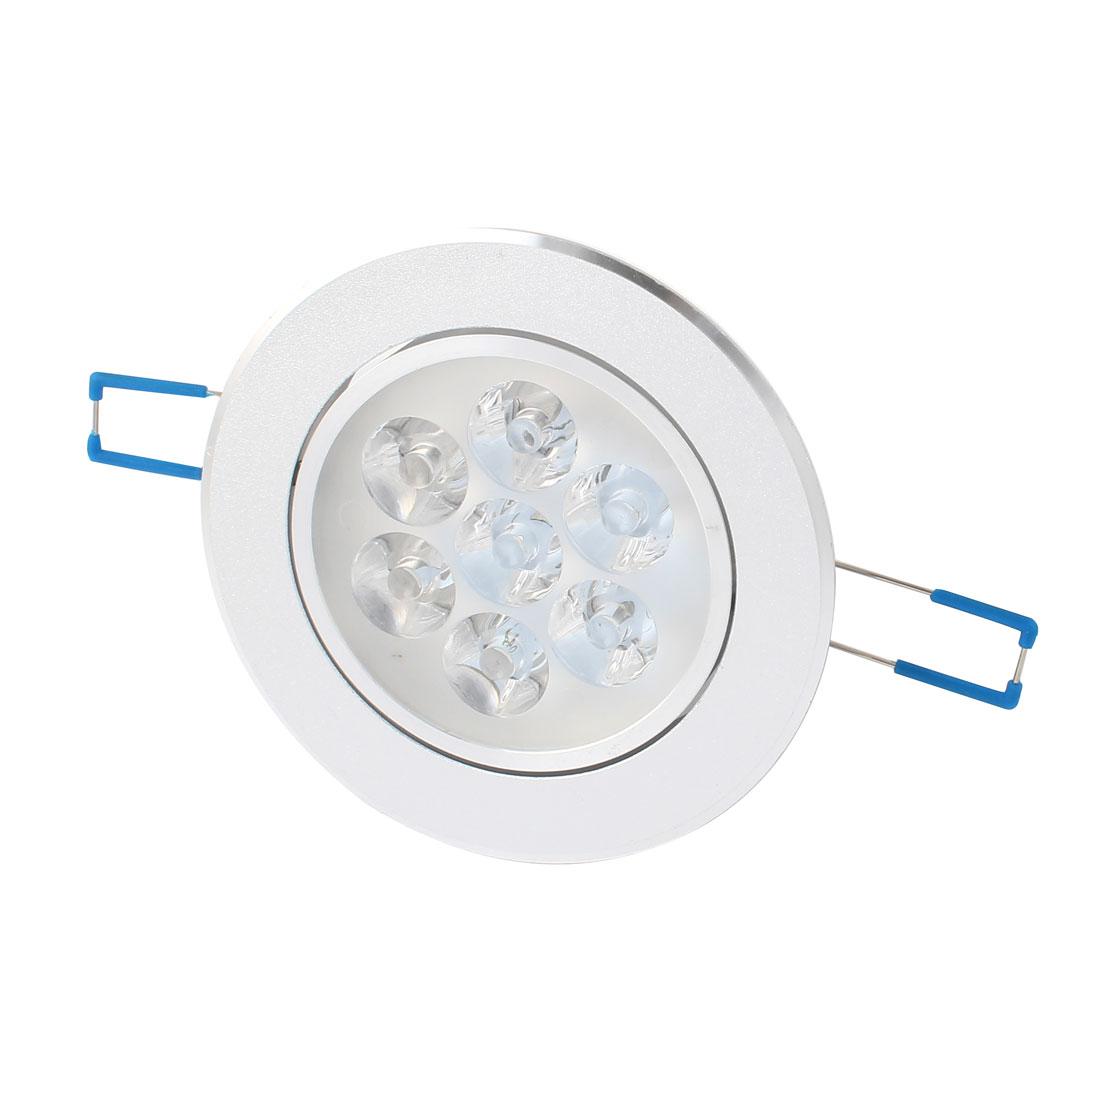 5W-7W Silver Tone 108mm Dia Ceiling Down Light Lamp Shell 7 LED Aluminum Heatsink